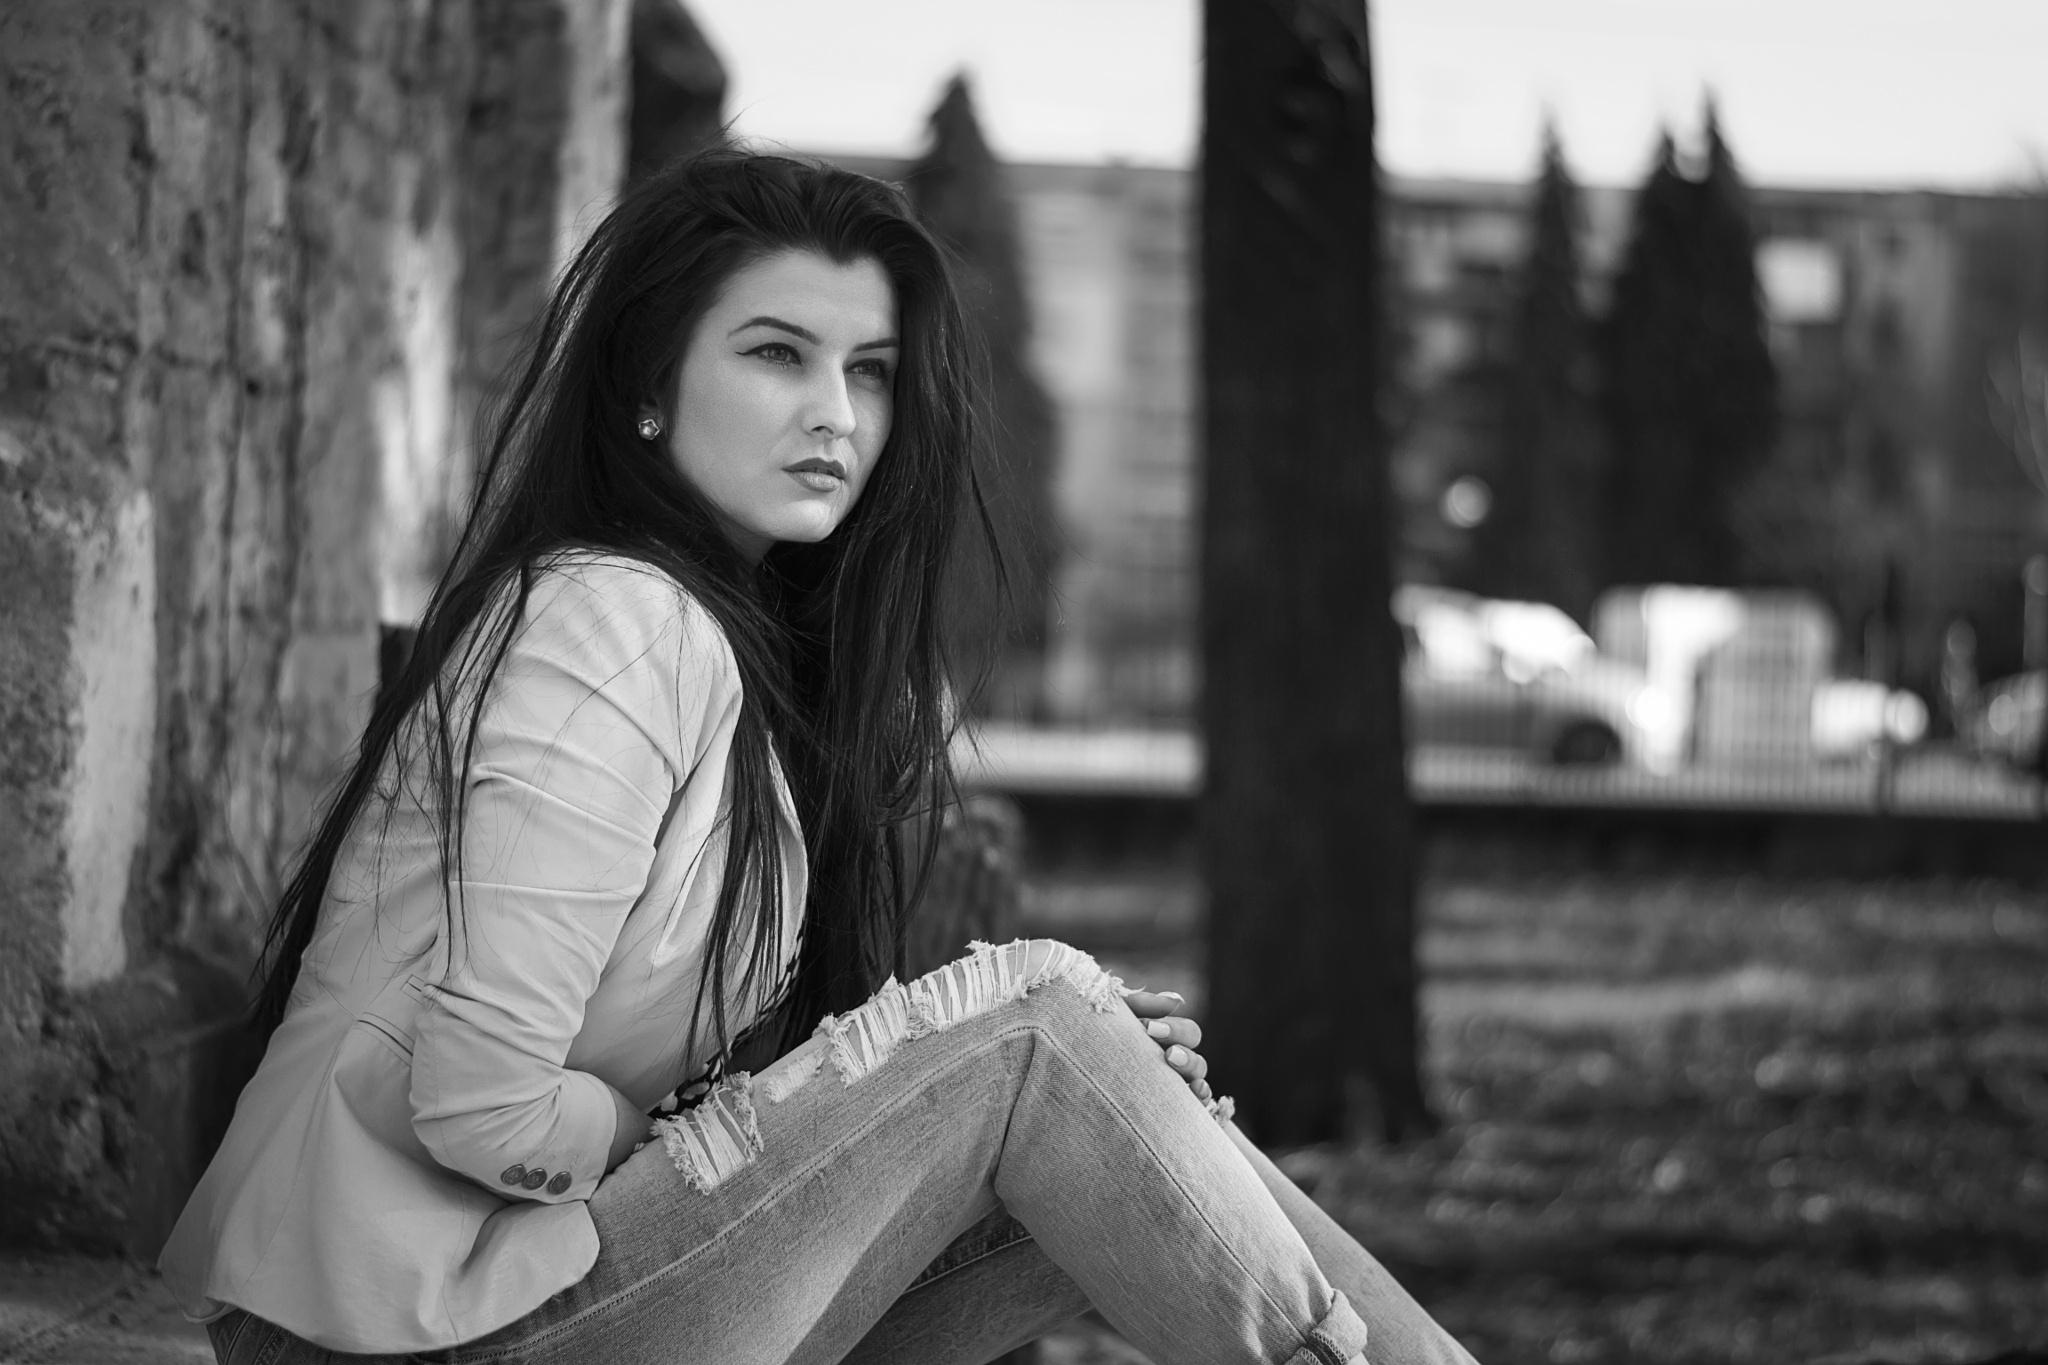 Melinda by Varga Mark